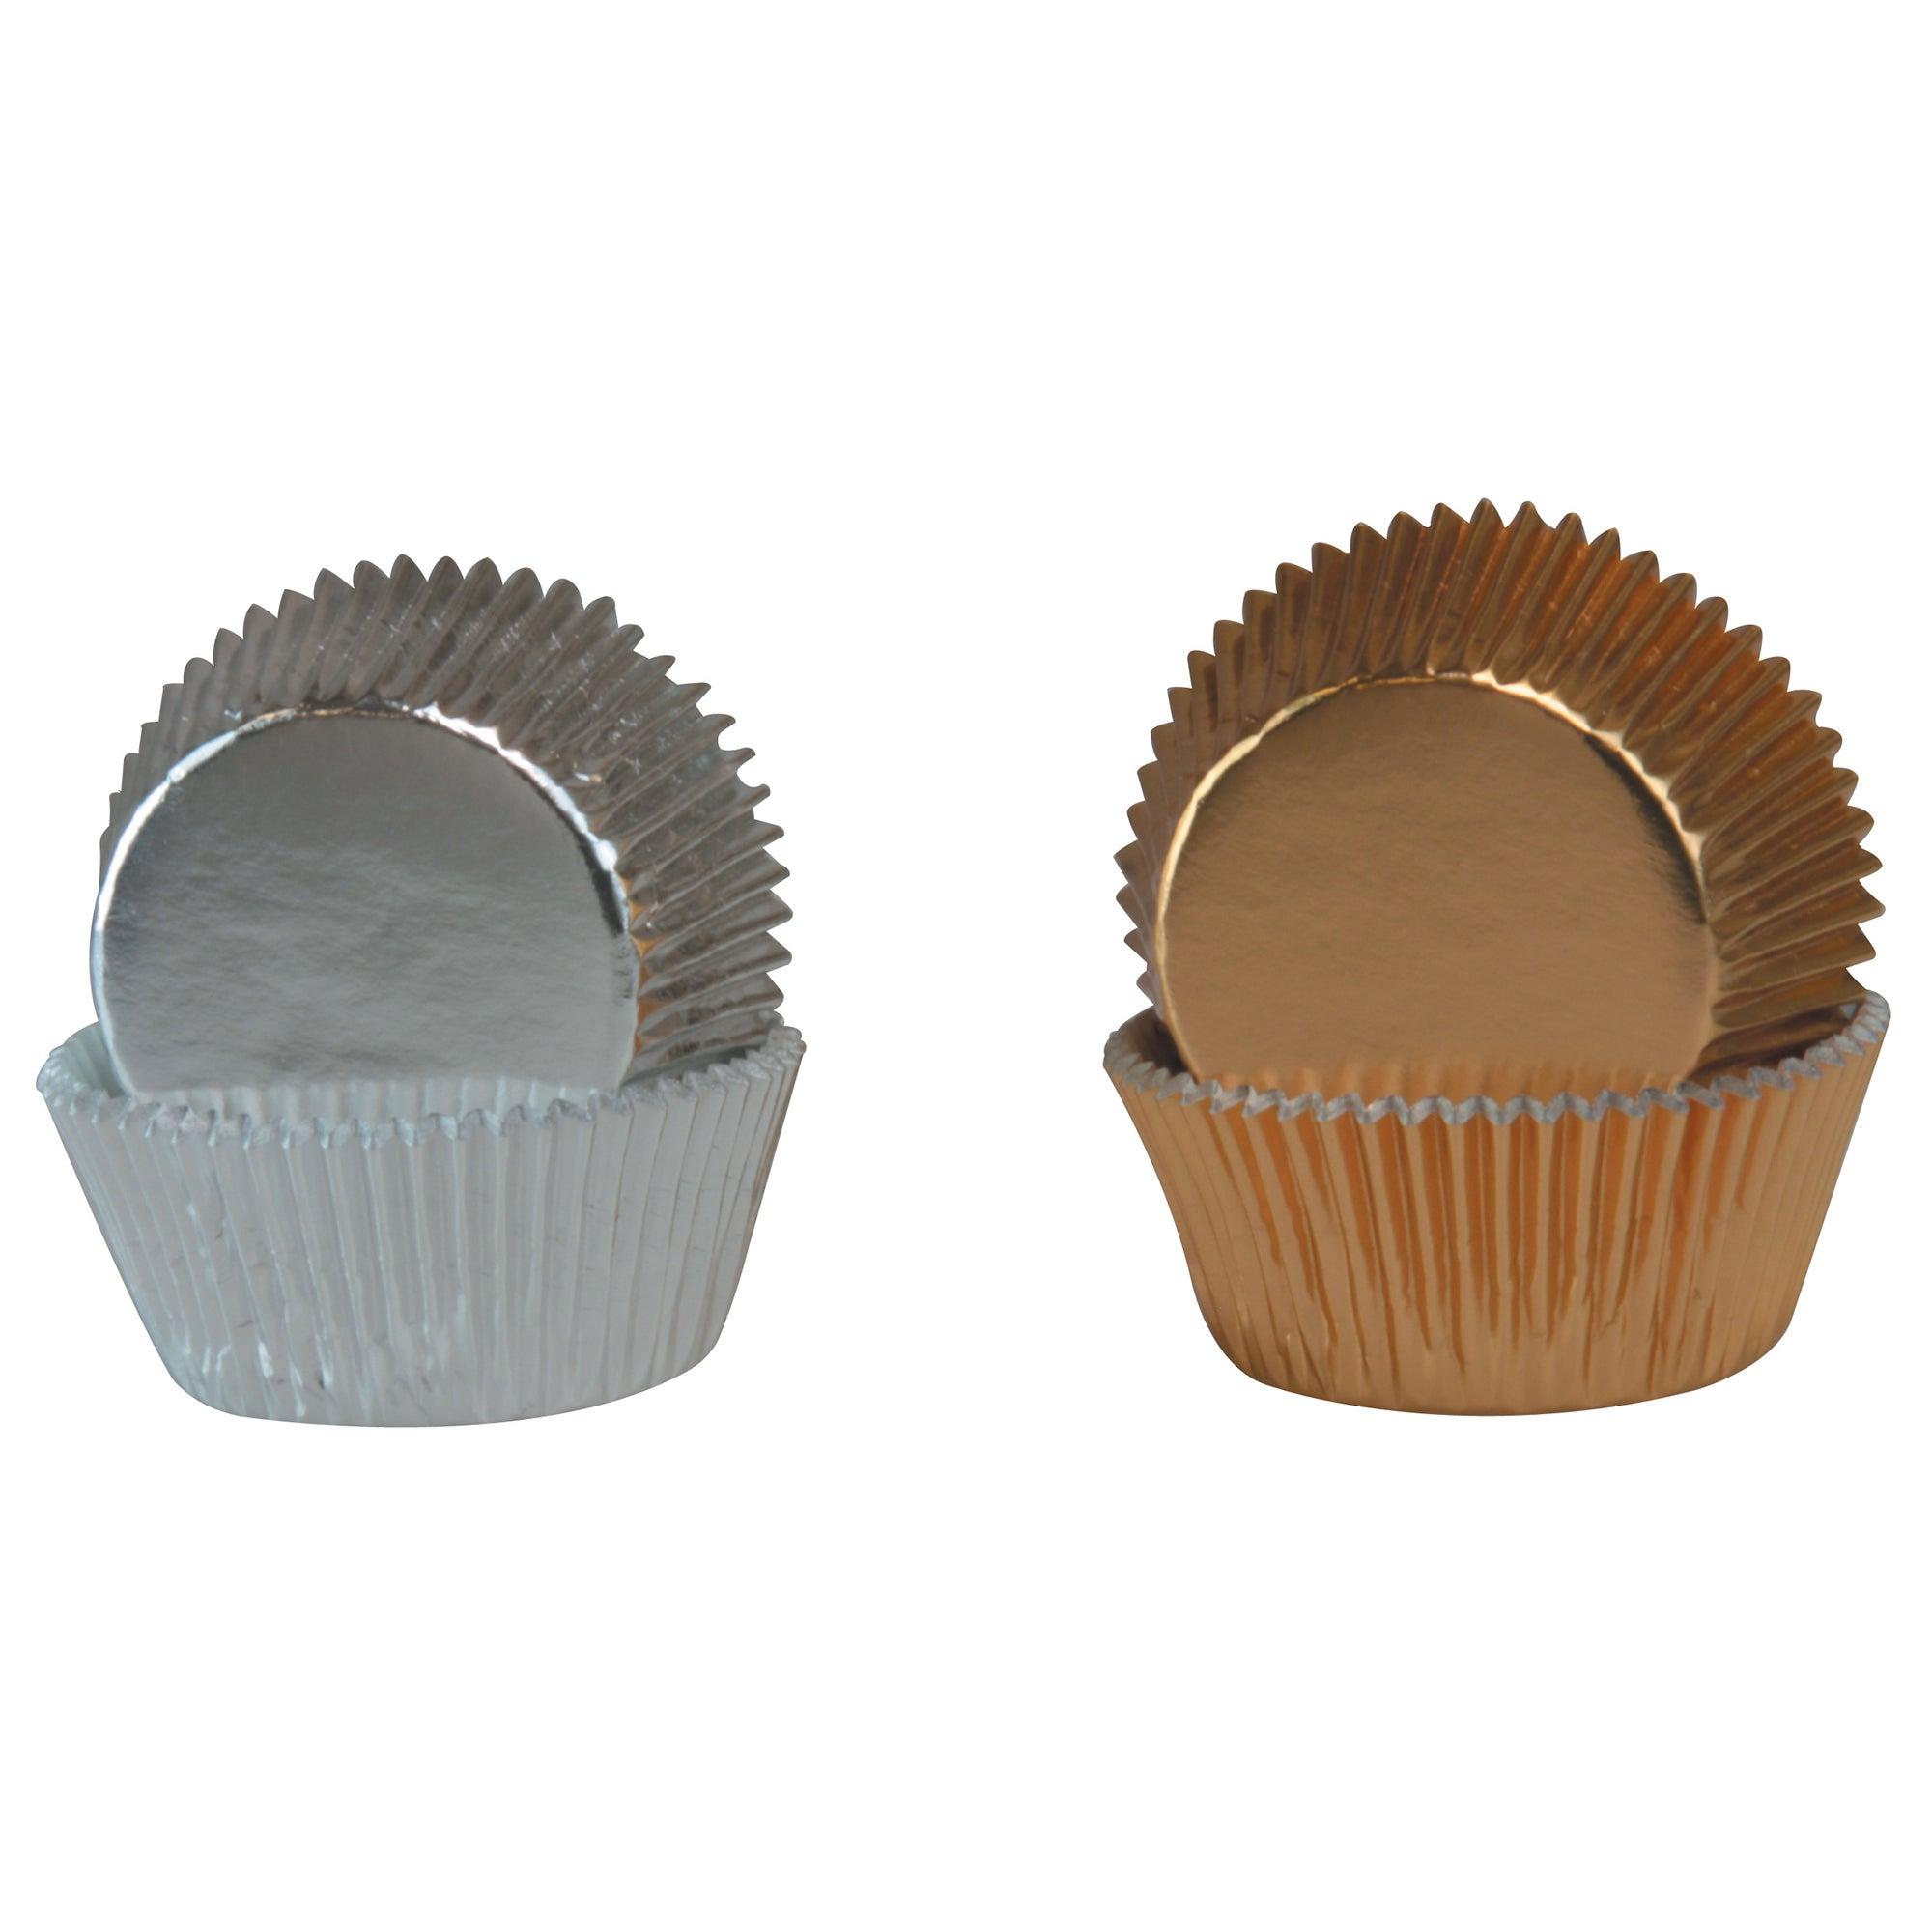 Pack of 36 Metallic Cupcake Cases